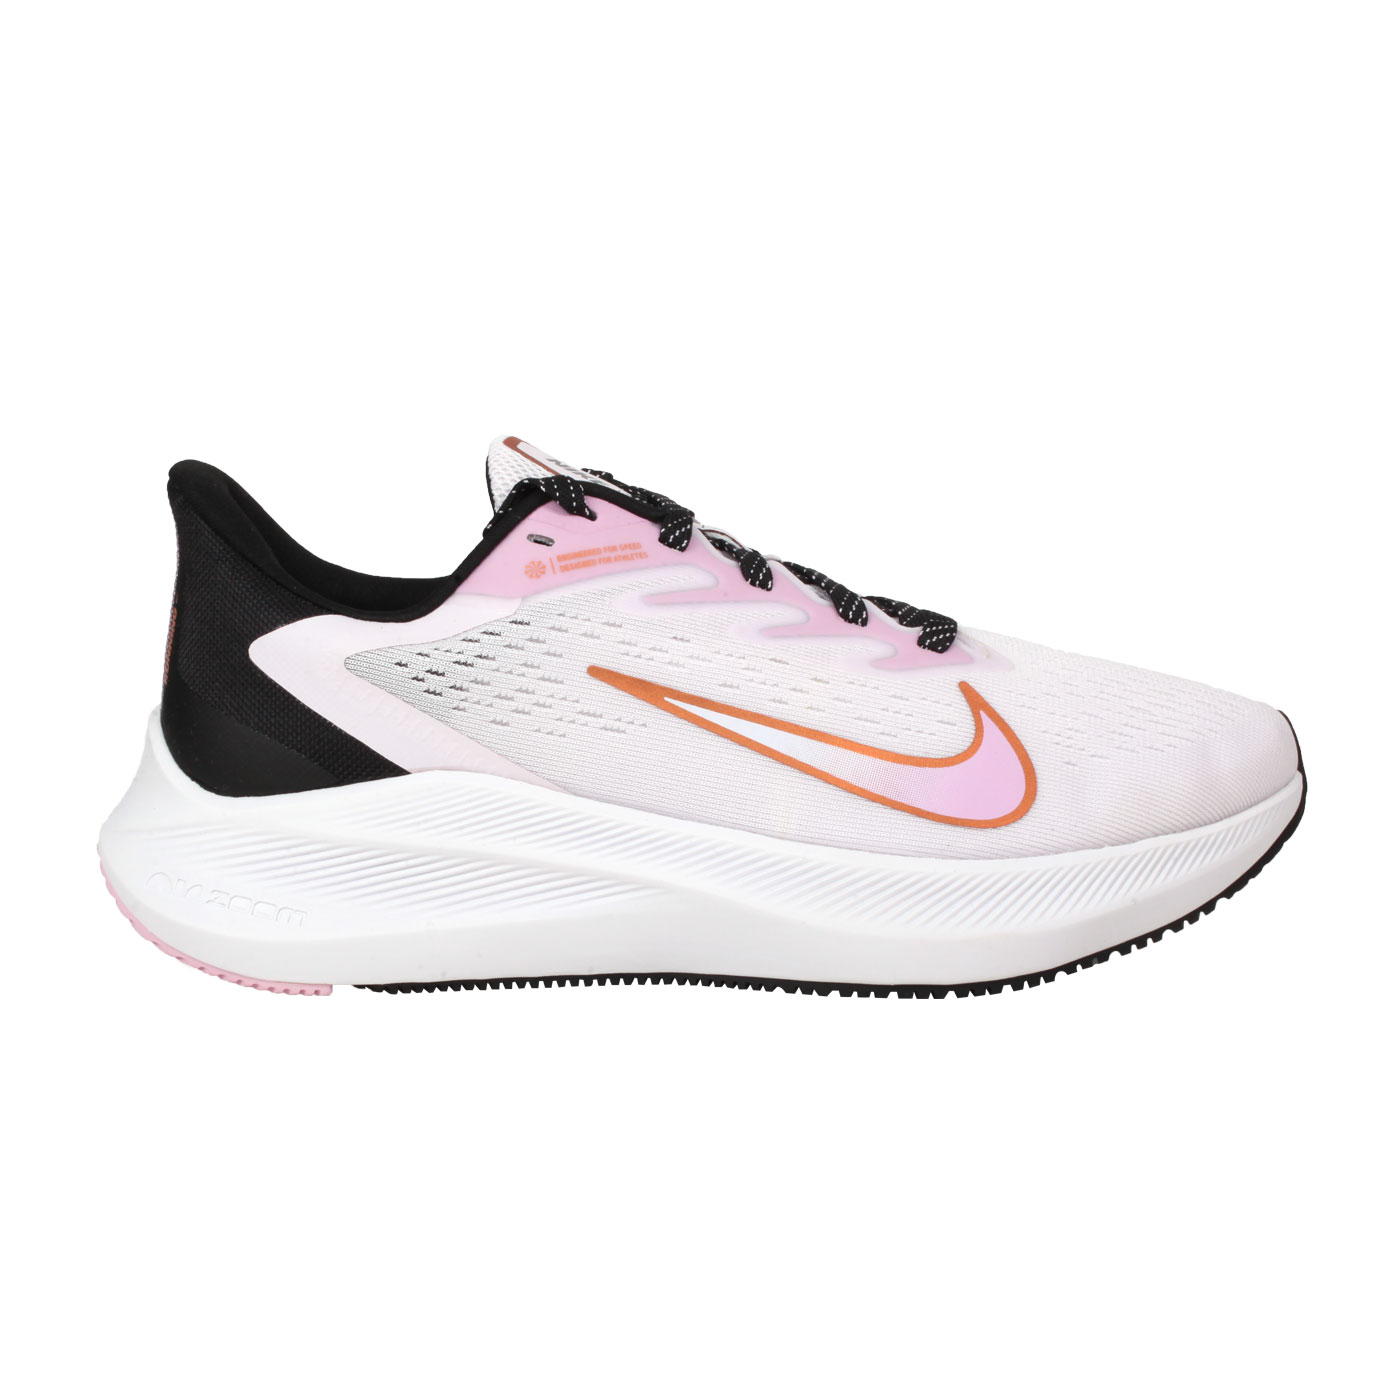 NIKE 女款運動鞋  @WMNS  ZOOM WINFLO 7@CJ0302501 - 粉紅玫瑰金